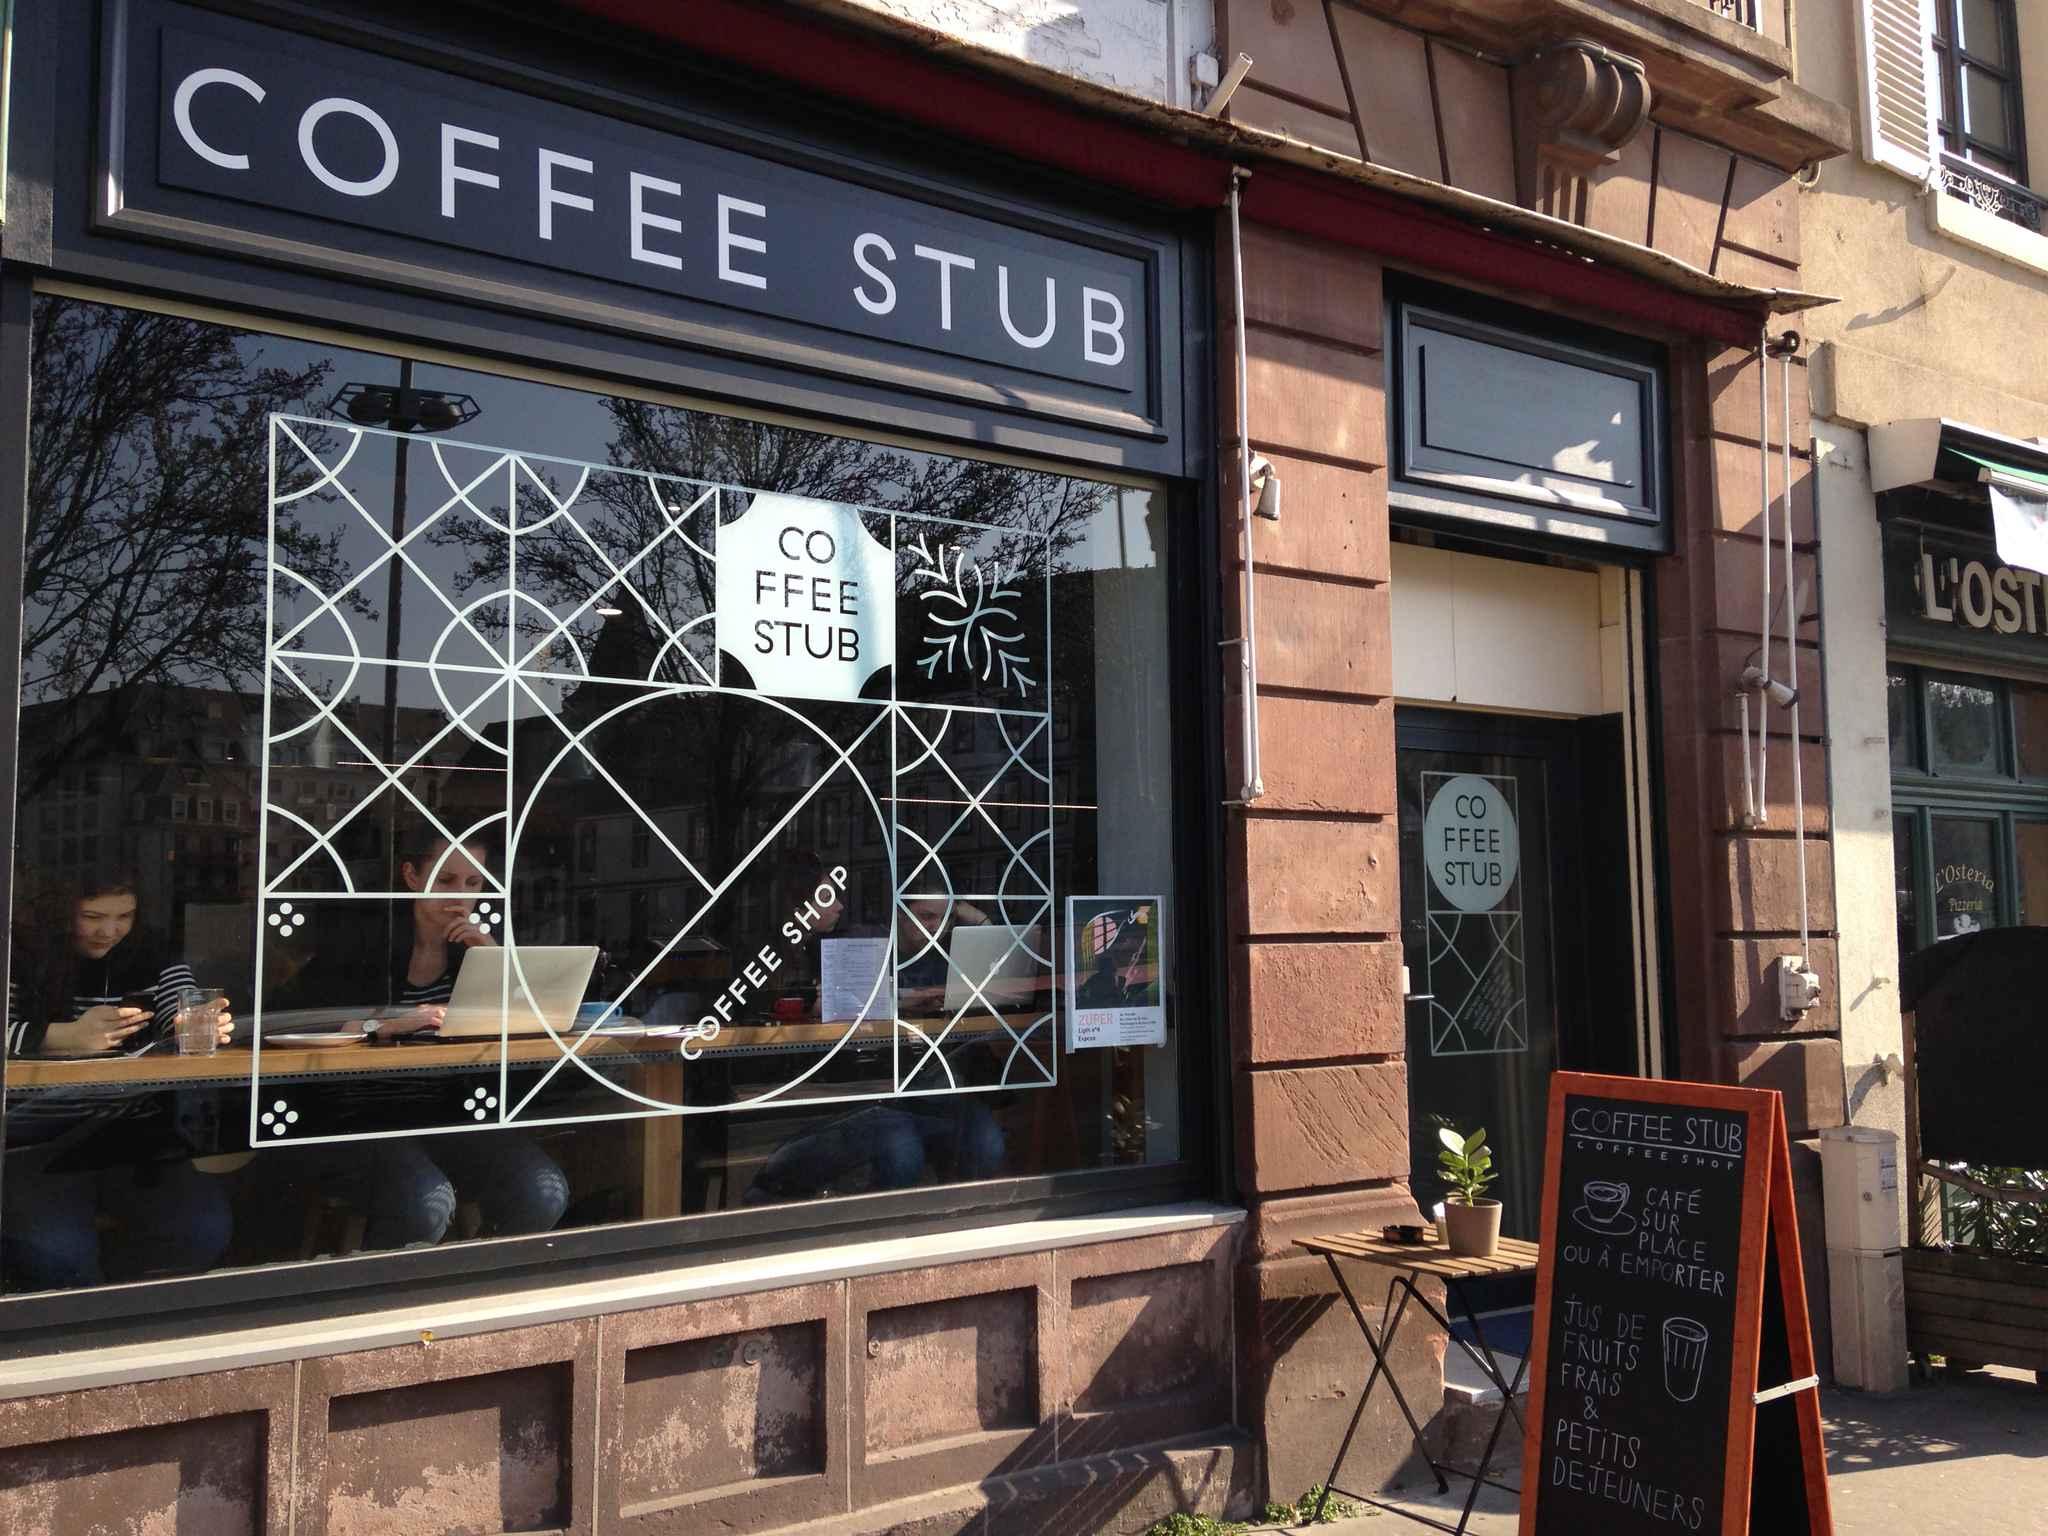 strasbourg caf et service compris tout est 100 alsacien au coffee stub. Black Bedroom Furniture Sets. Home Design Ideas